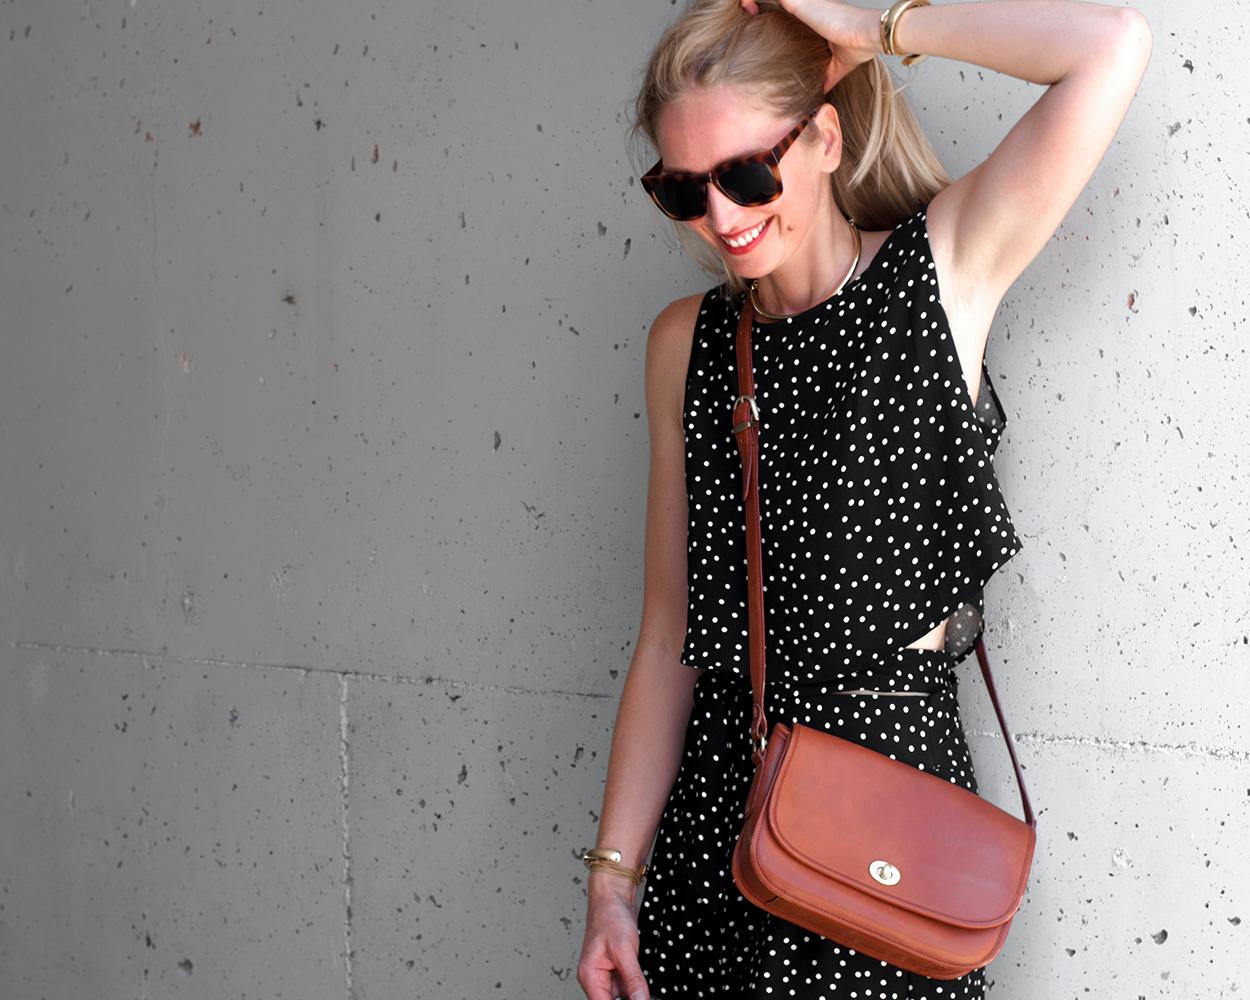 Coach Classic City Bag, Summer Blogger Style